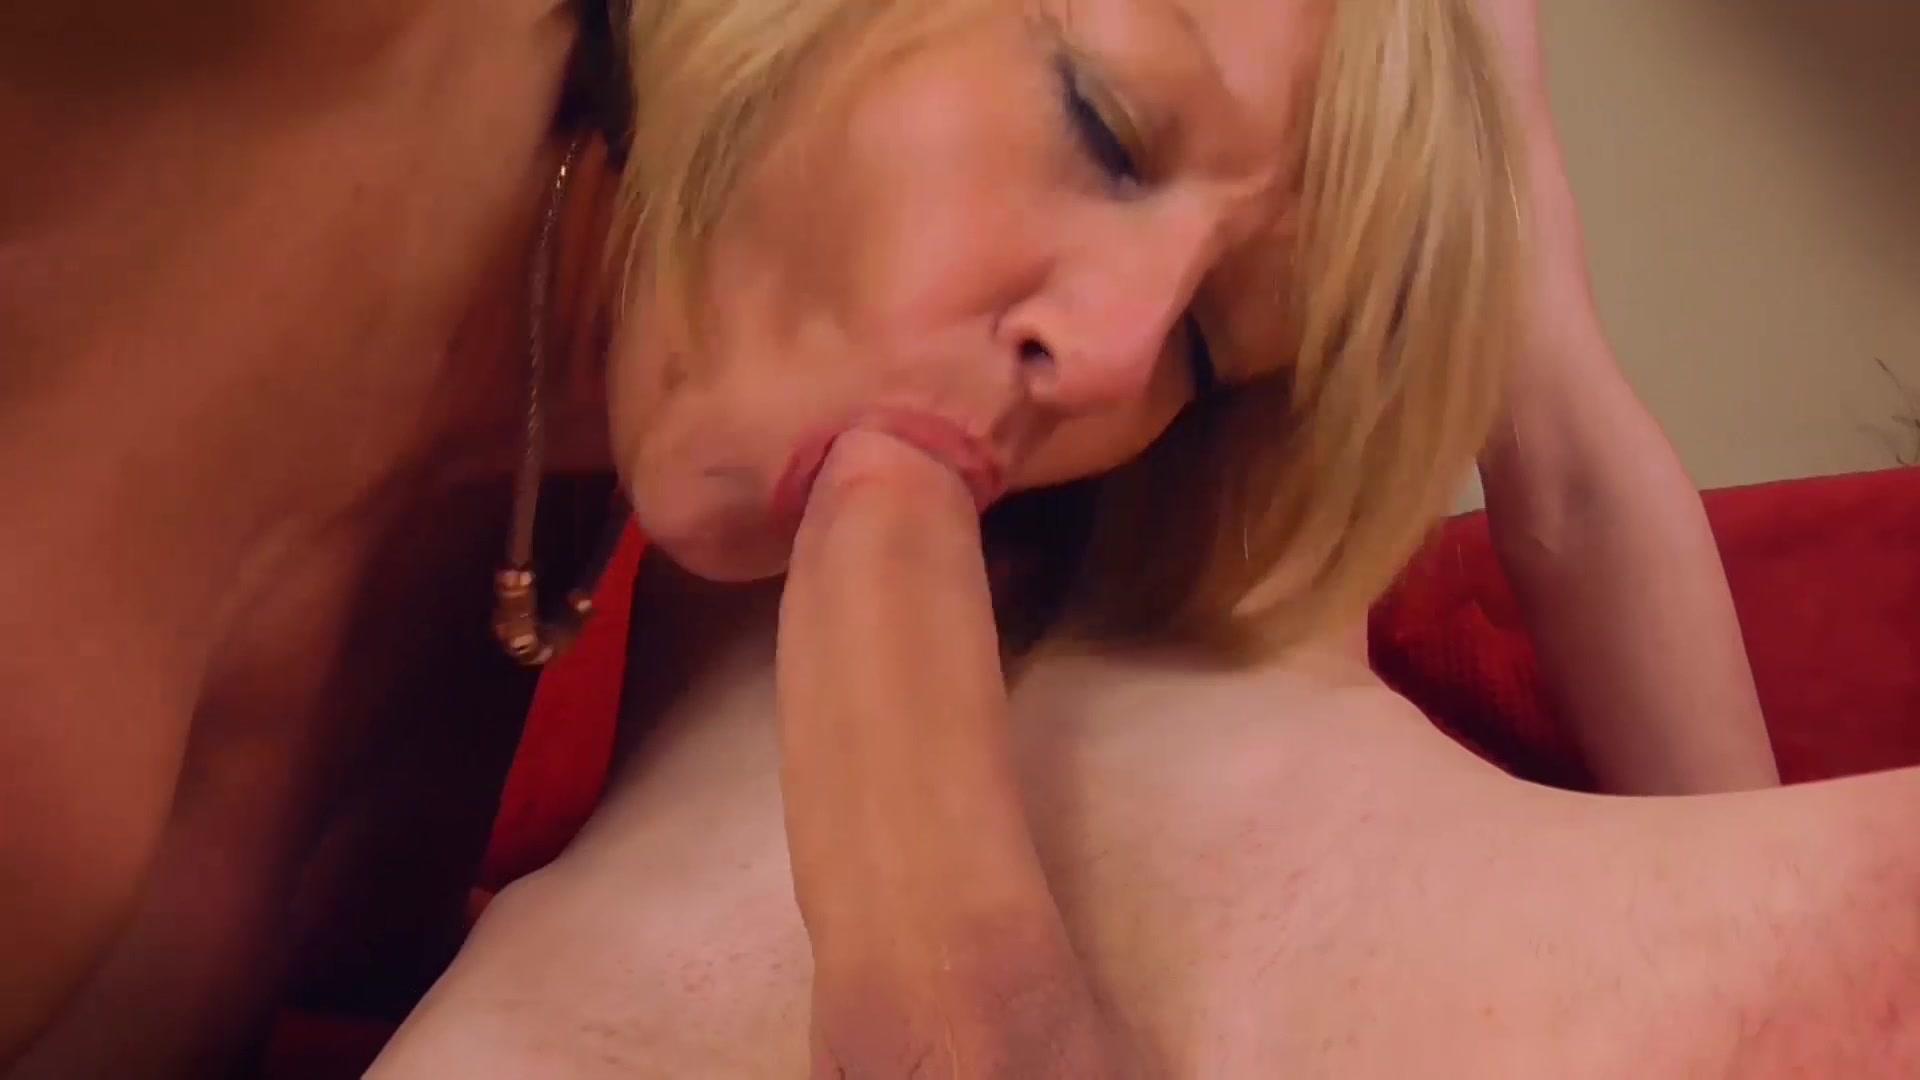 Nude 18+ Lavish styles porn actress